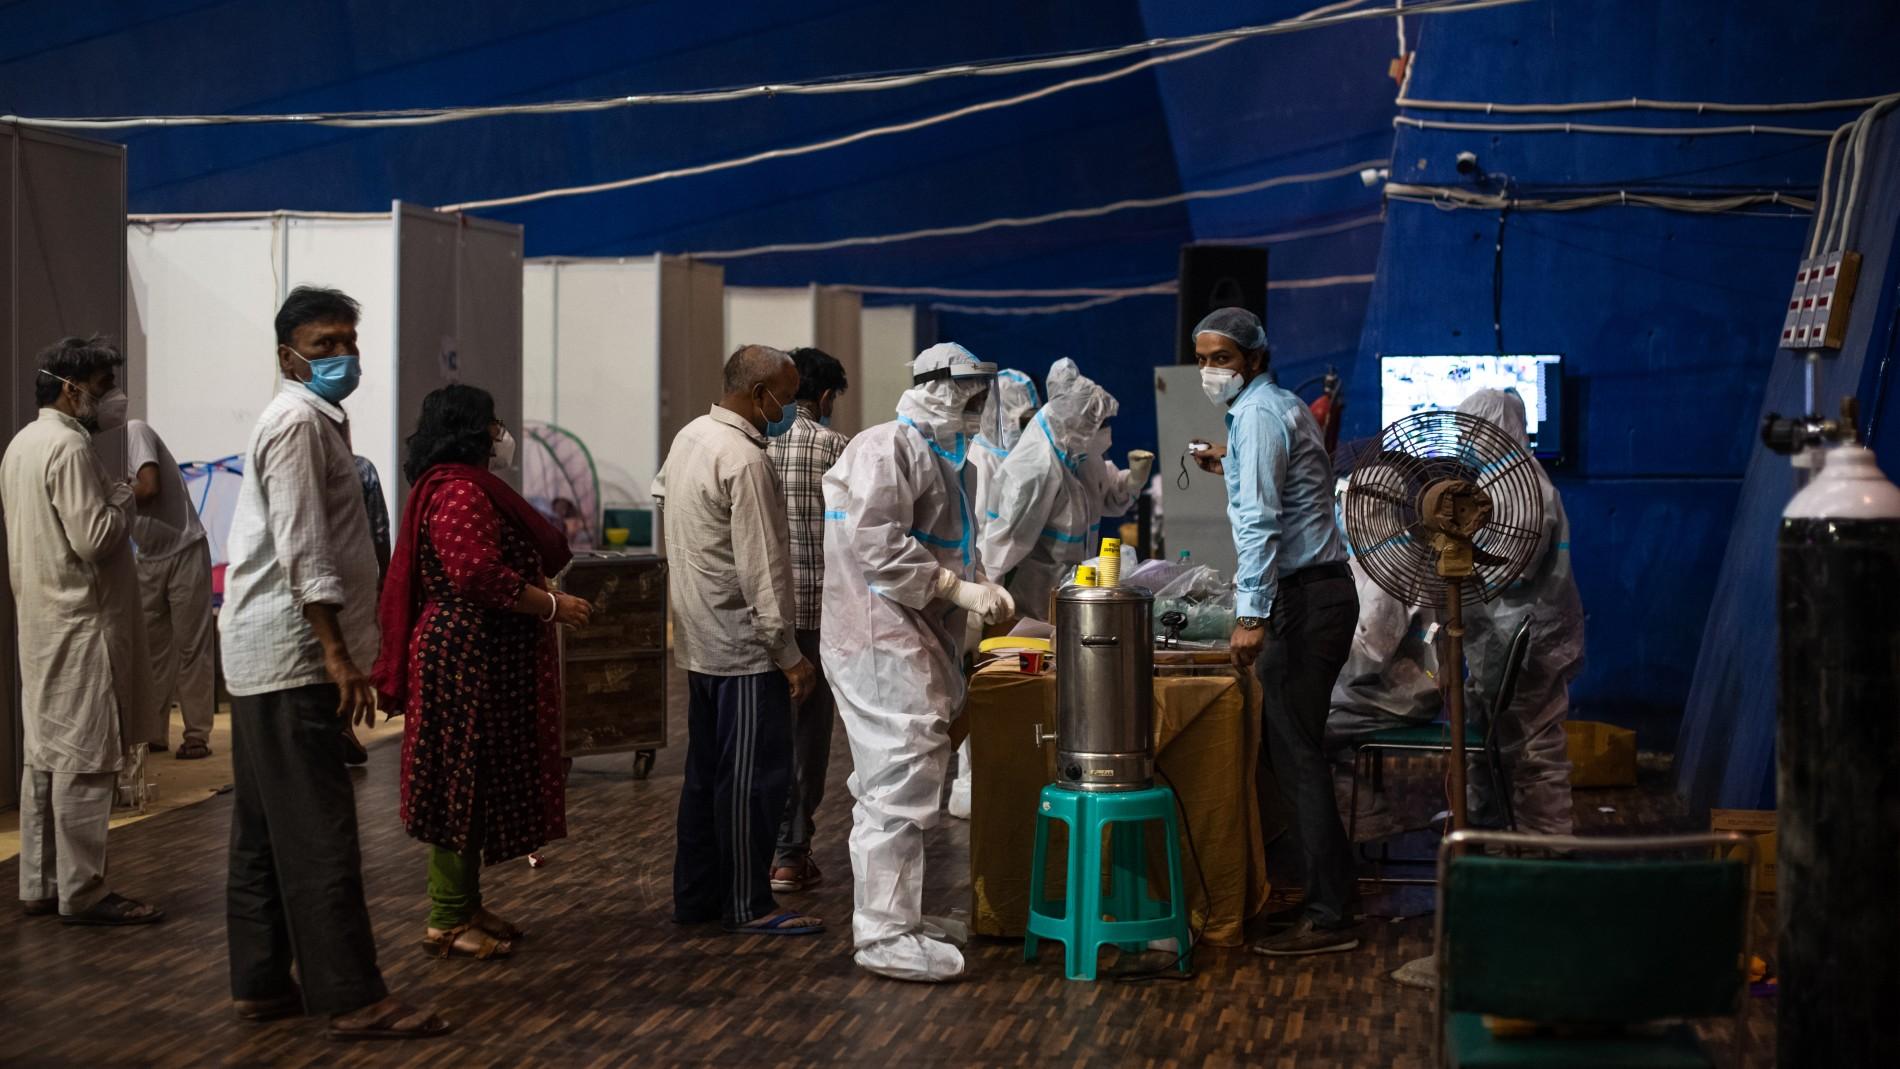 India enfrenta escasez de vacunas con récord de muertes por COVID-19